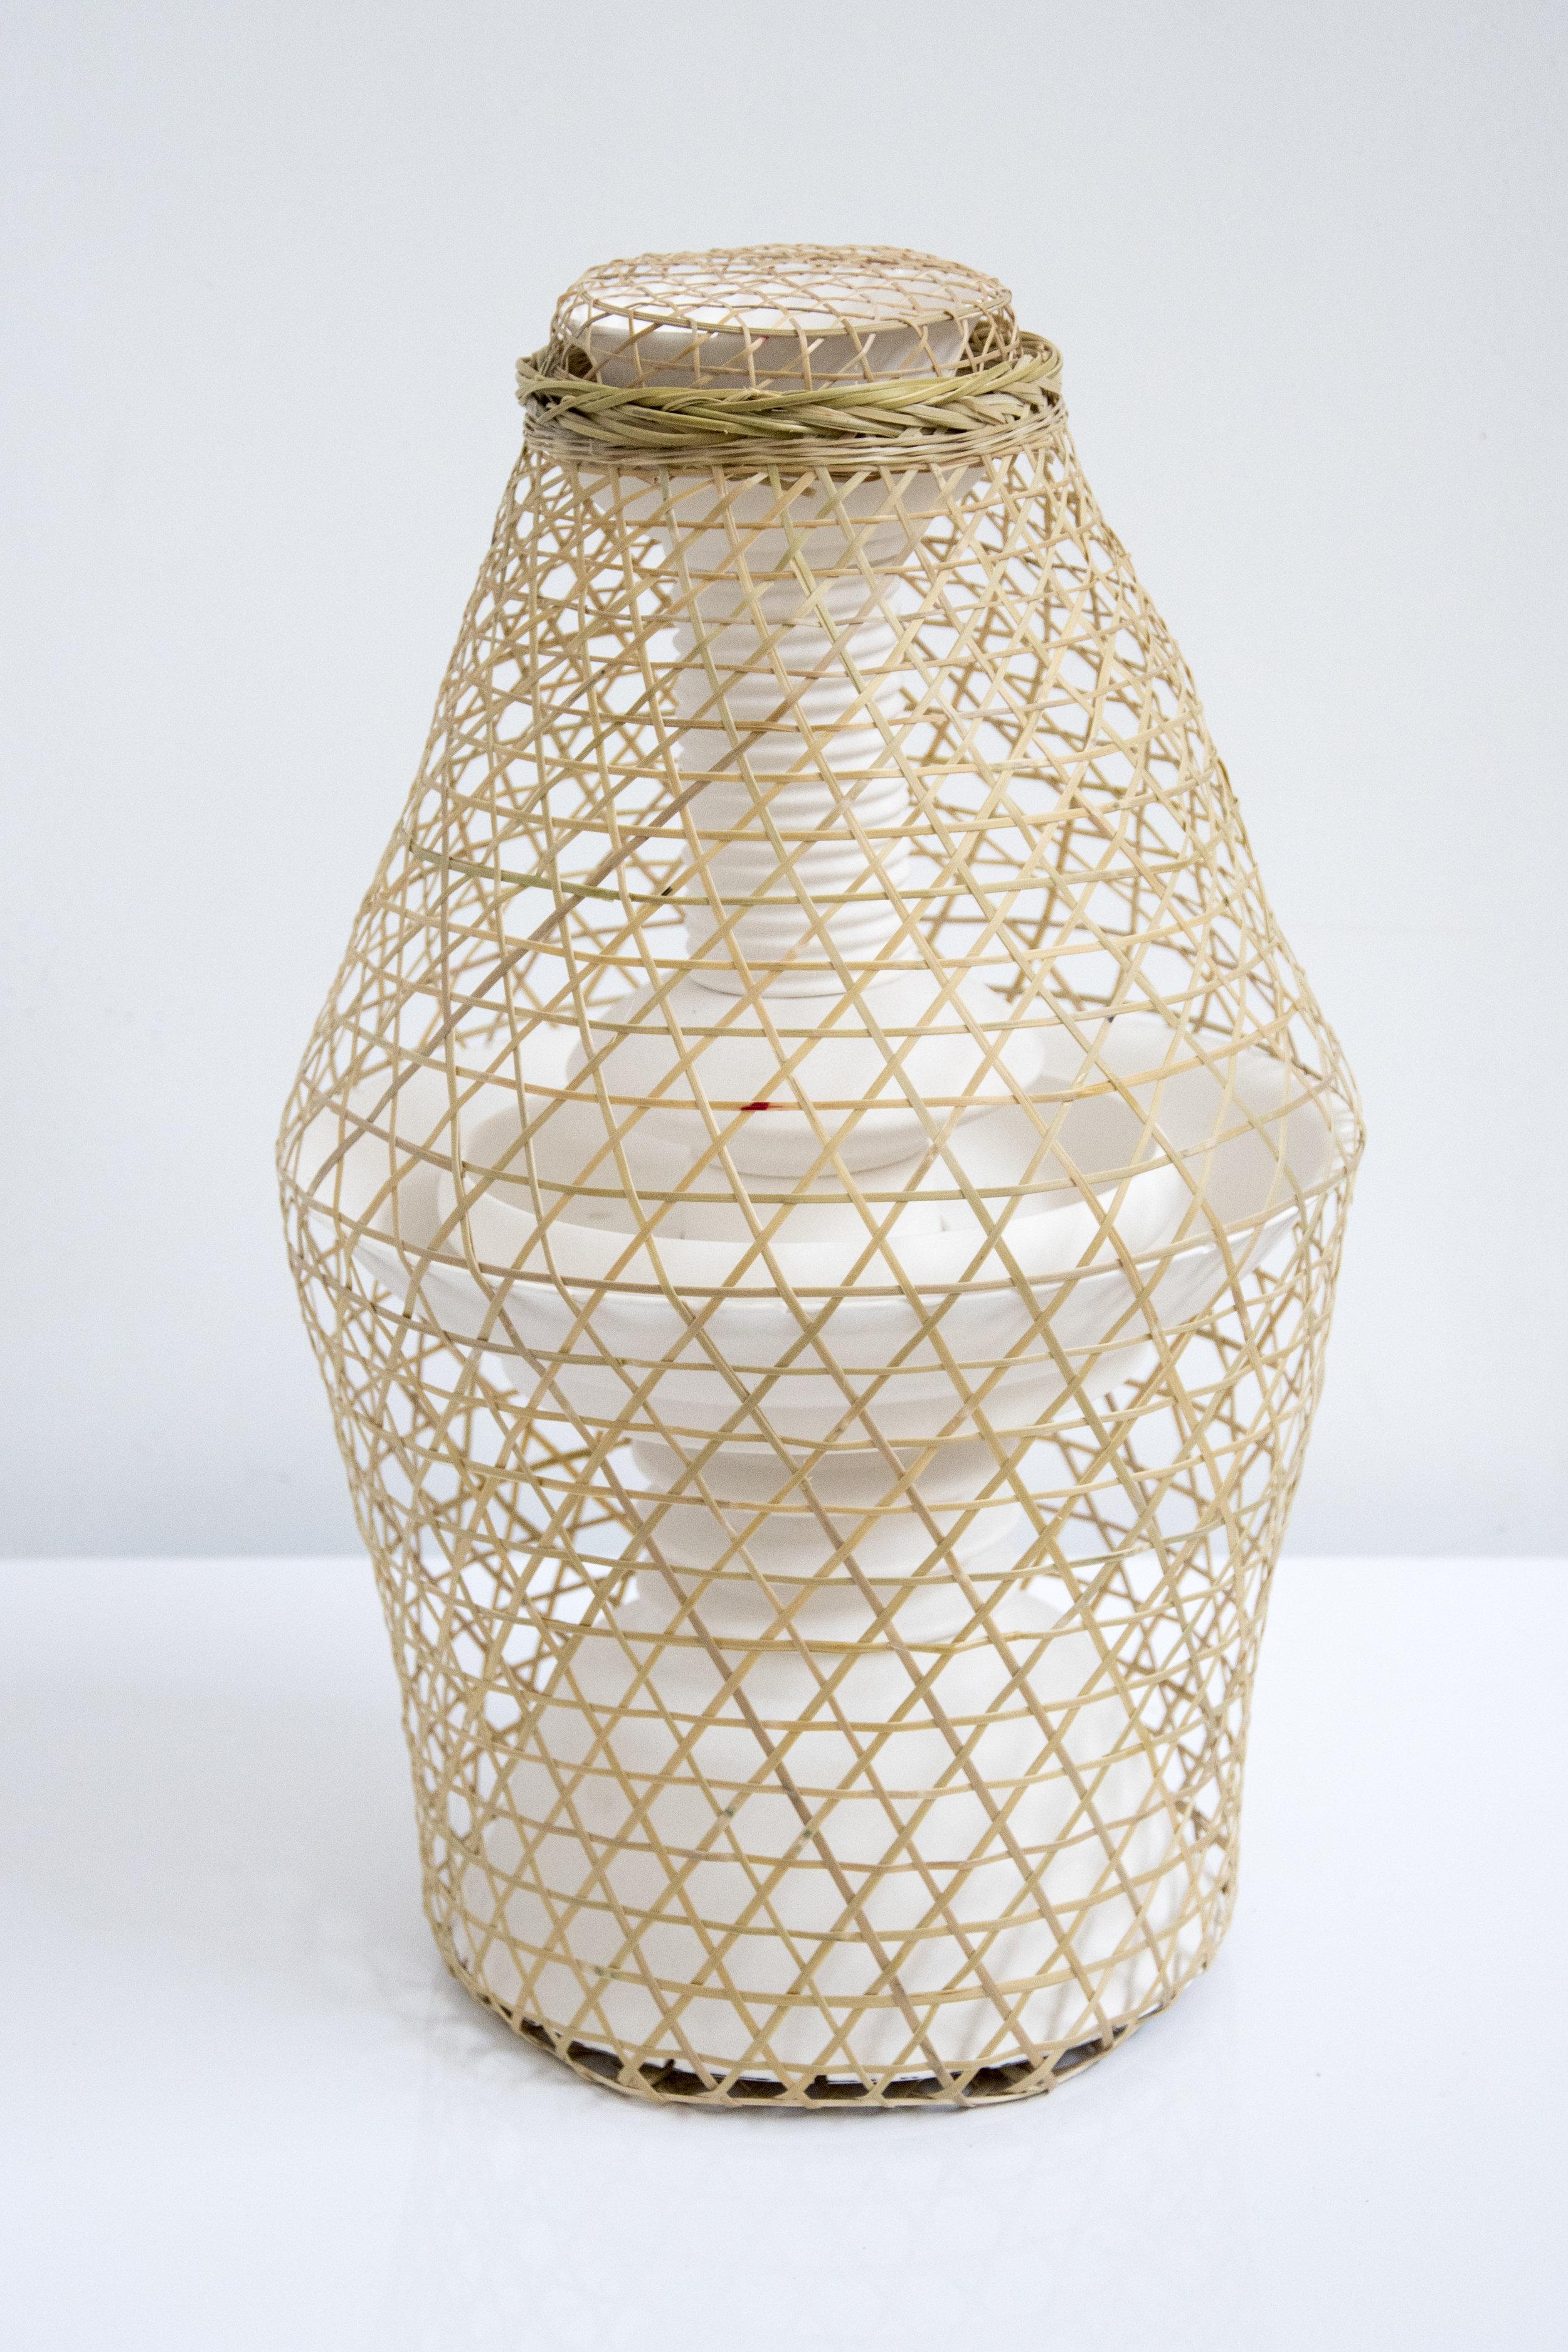 JDZ porcelain works - David Derksen15.jpg